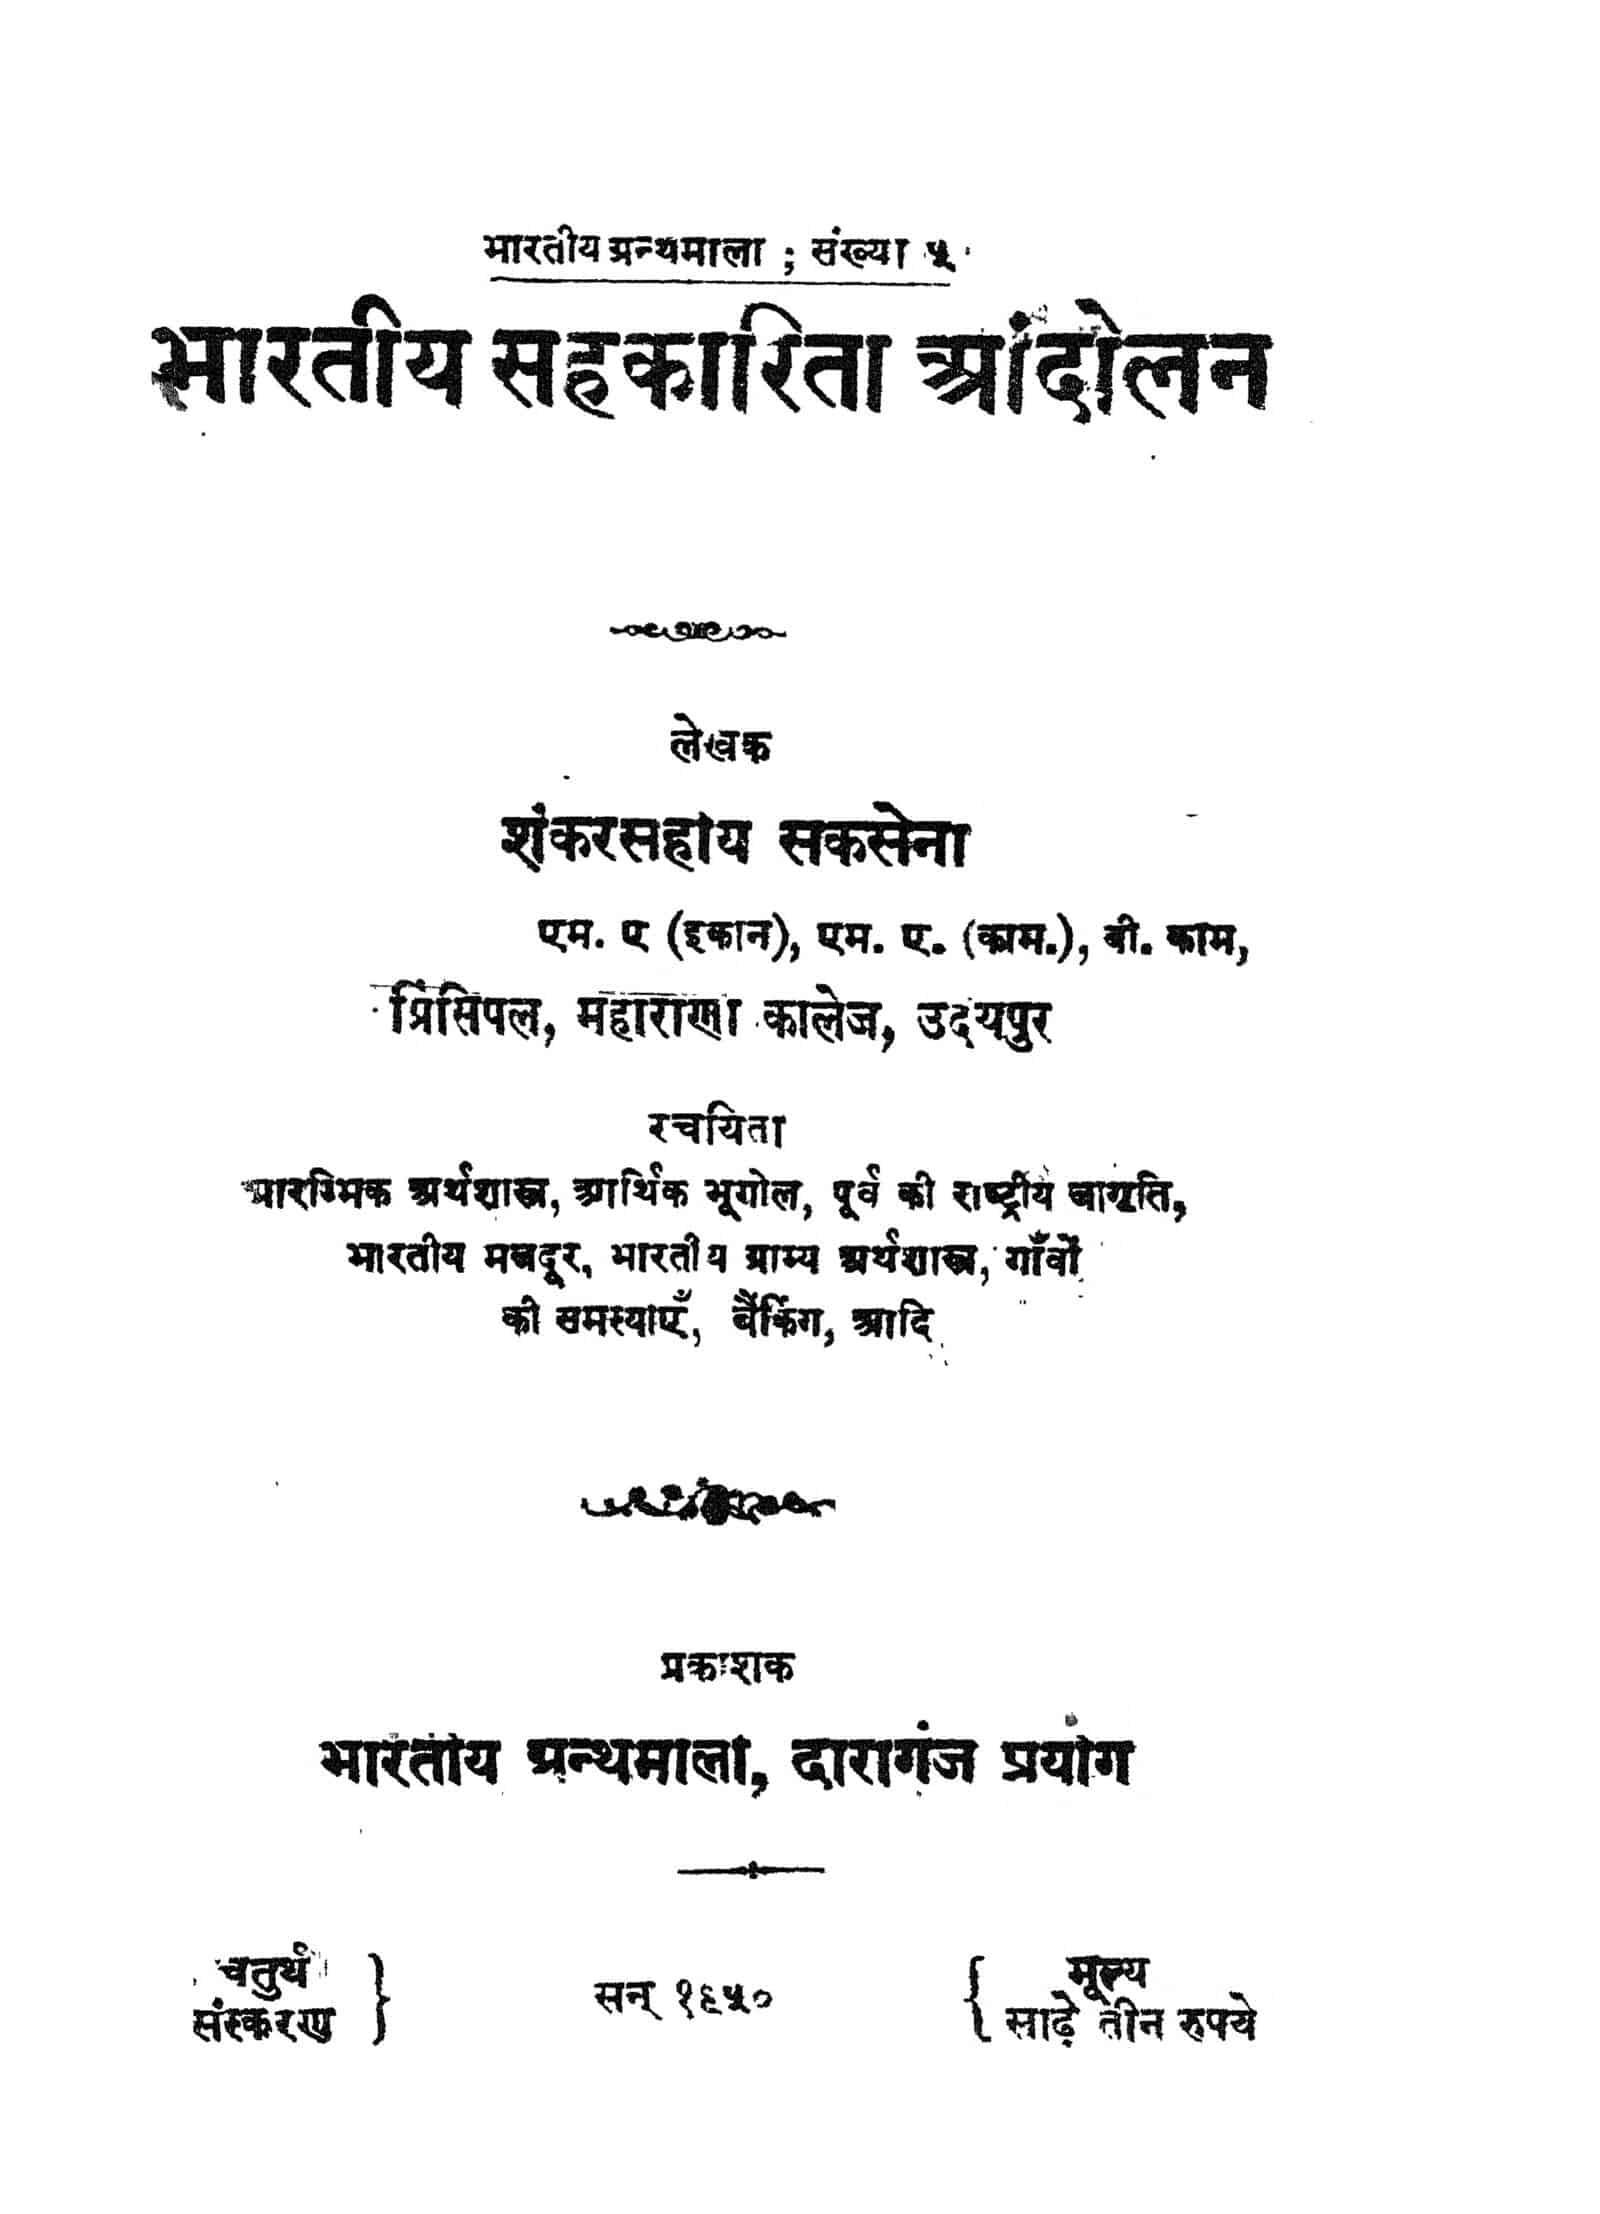 Book Image : भारतीय सहकारिता आन्दोलन - Bhartiya Sahkarita Andolan